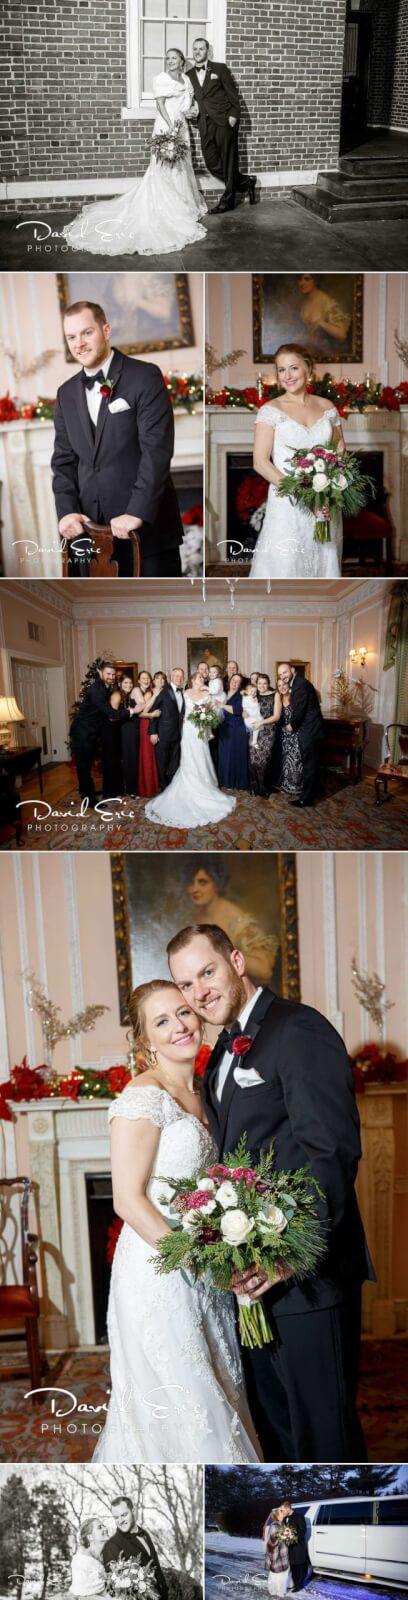 wedding photo at the westin govornor morris in couple photos